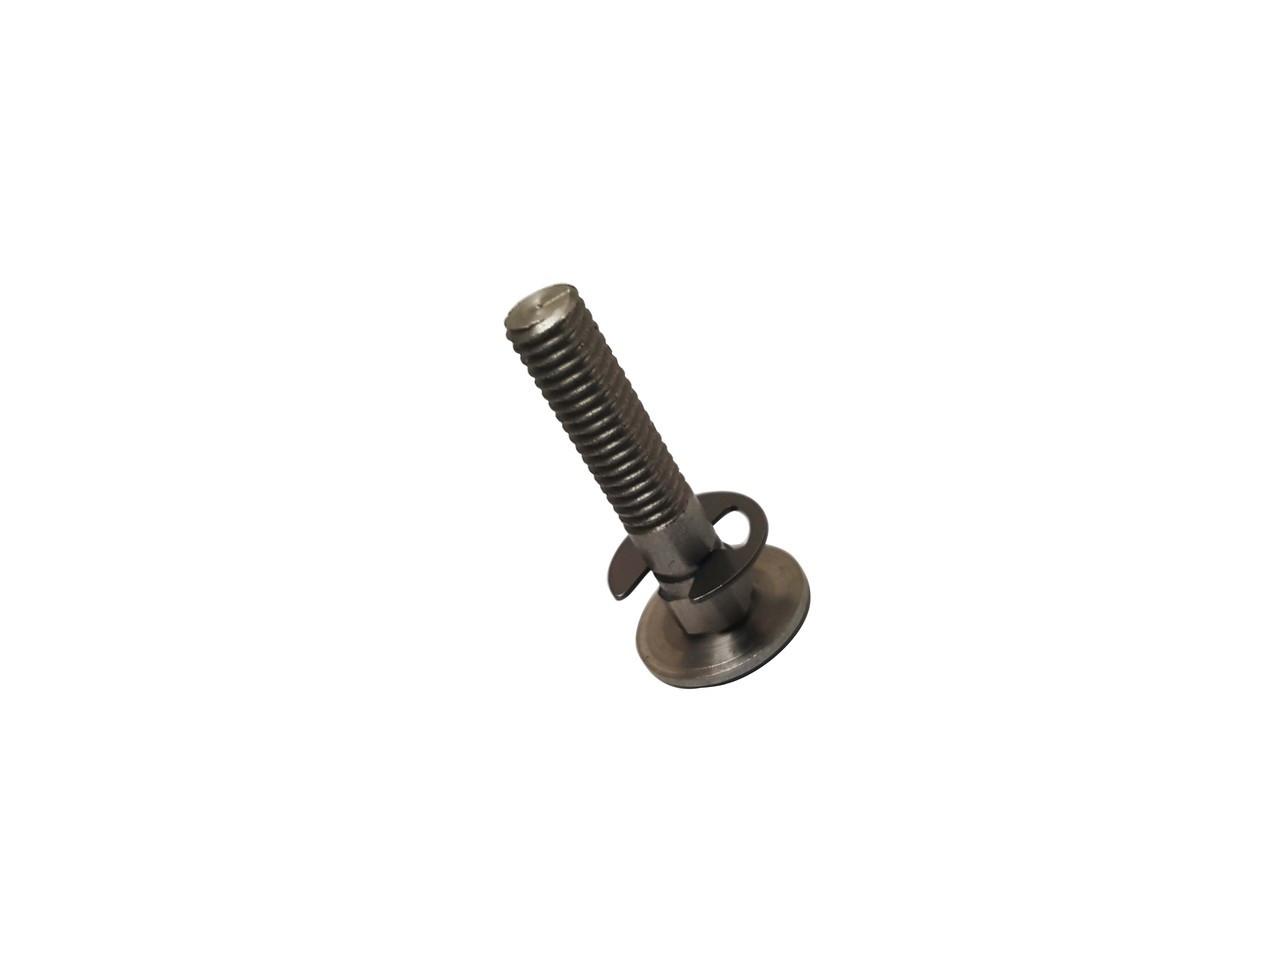 Bizerba Slicer - Remnant Holder Threaded Stud and Retaining Ring - SE12 - BZ090